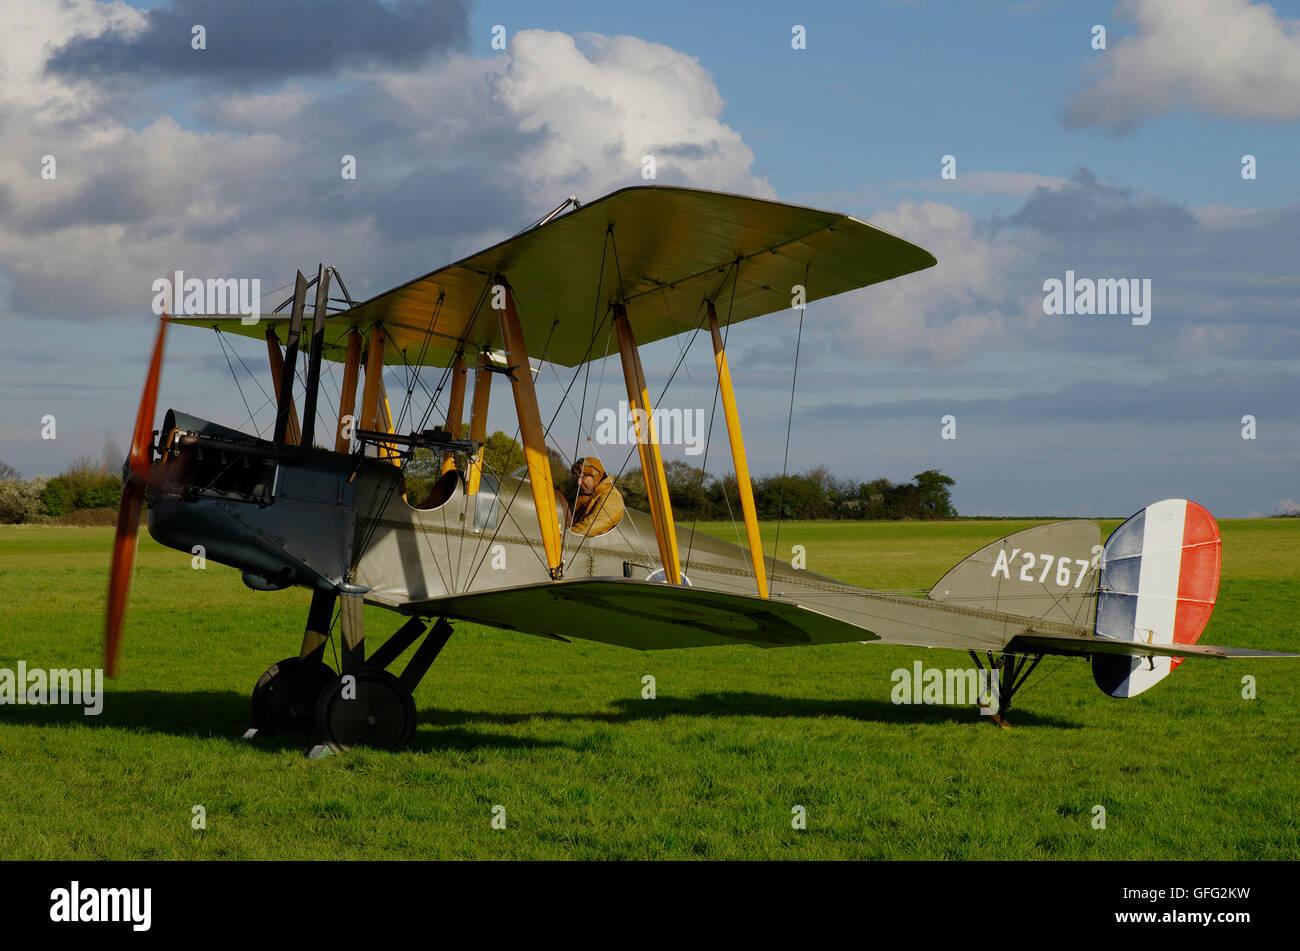 Be2e Replica at Stow Maries Aerodrome Essex - Stock Image